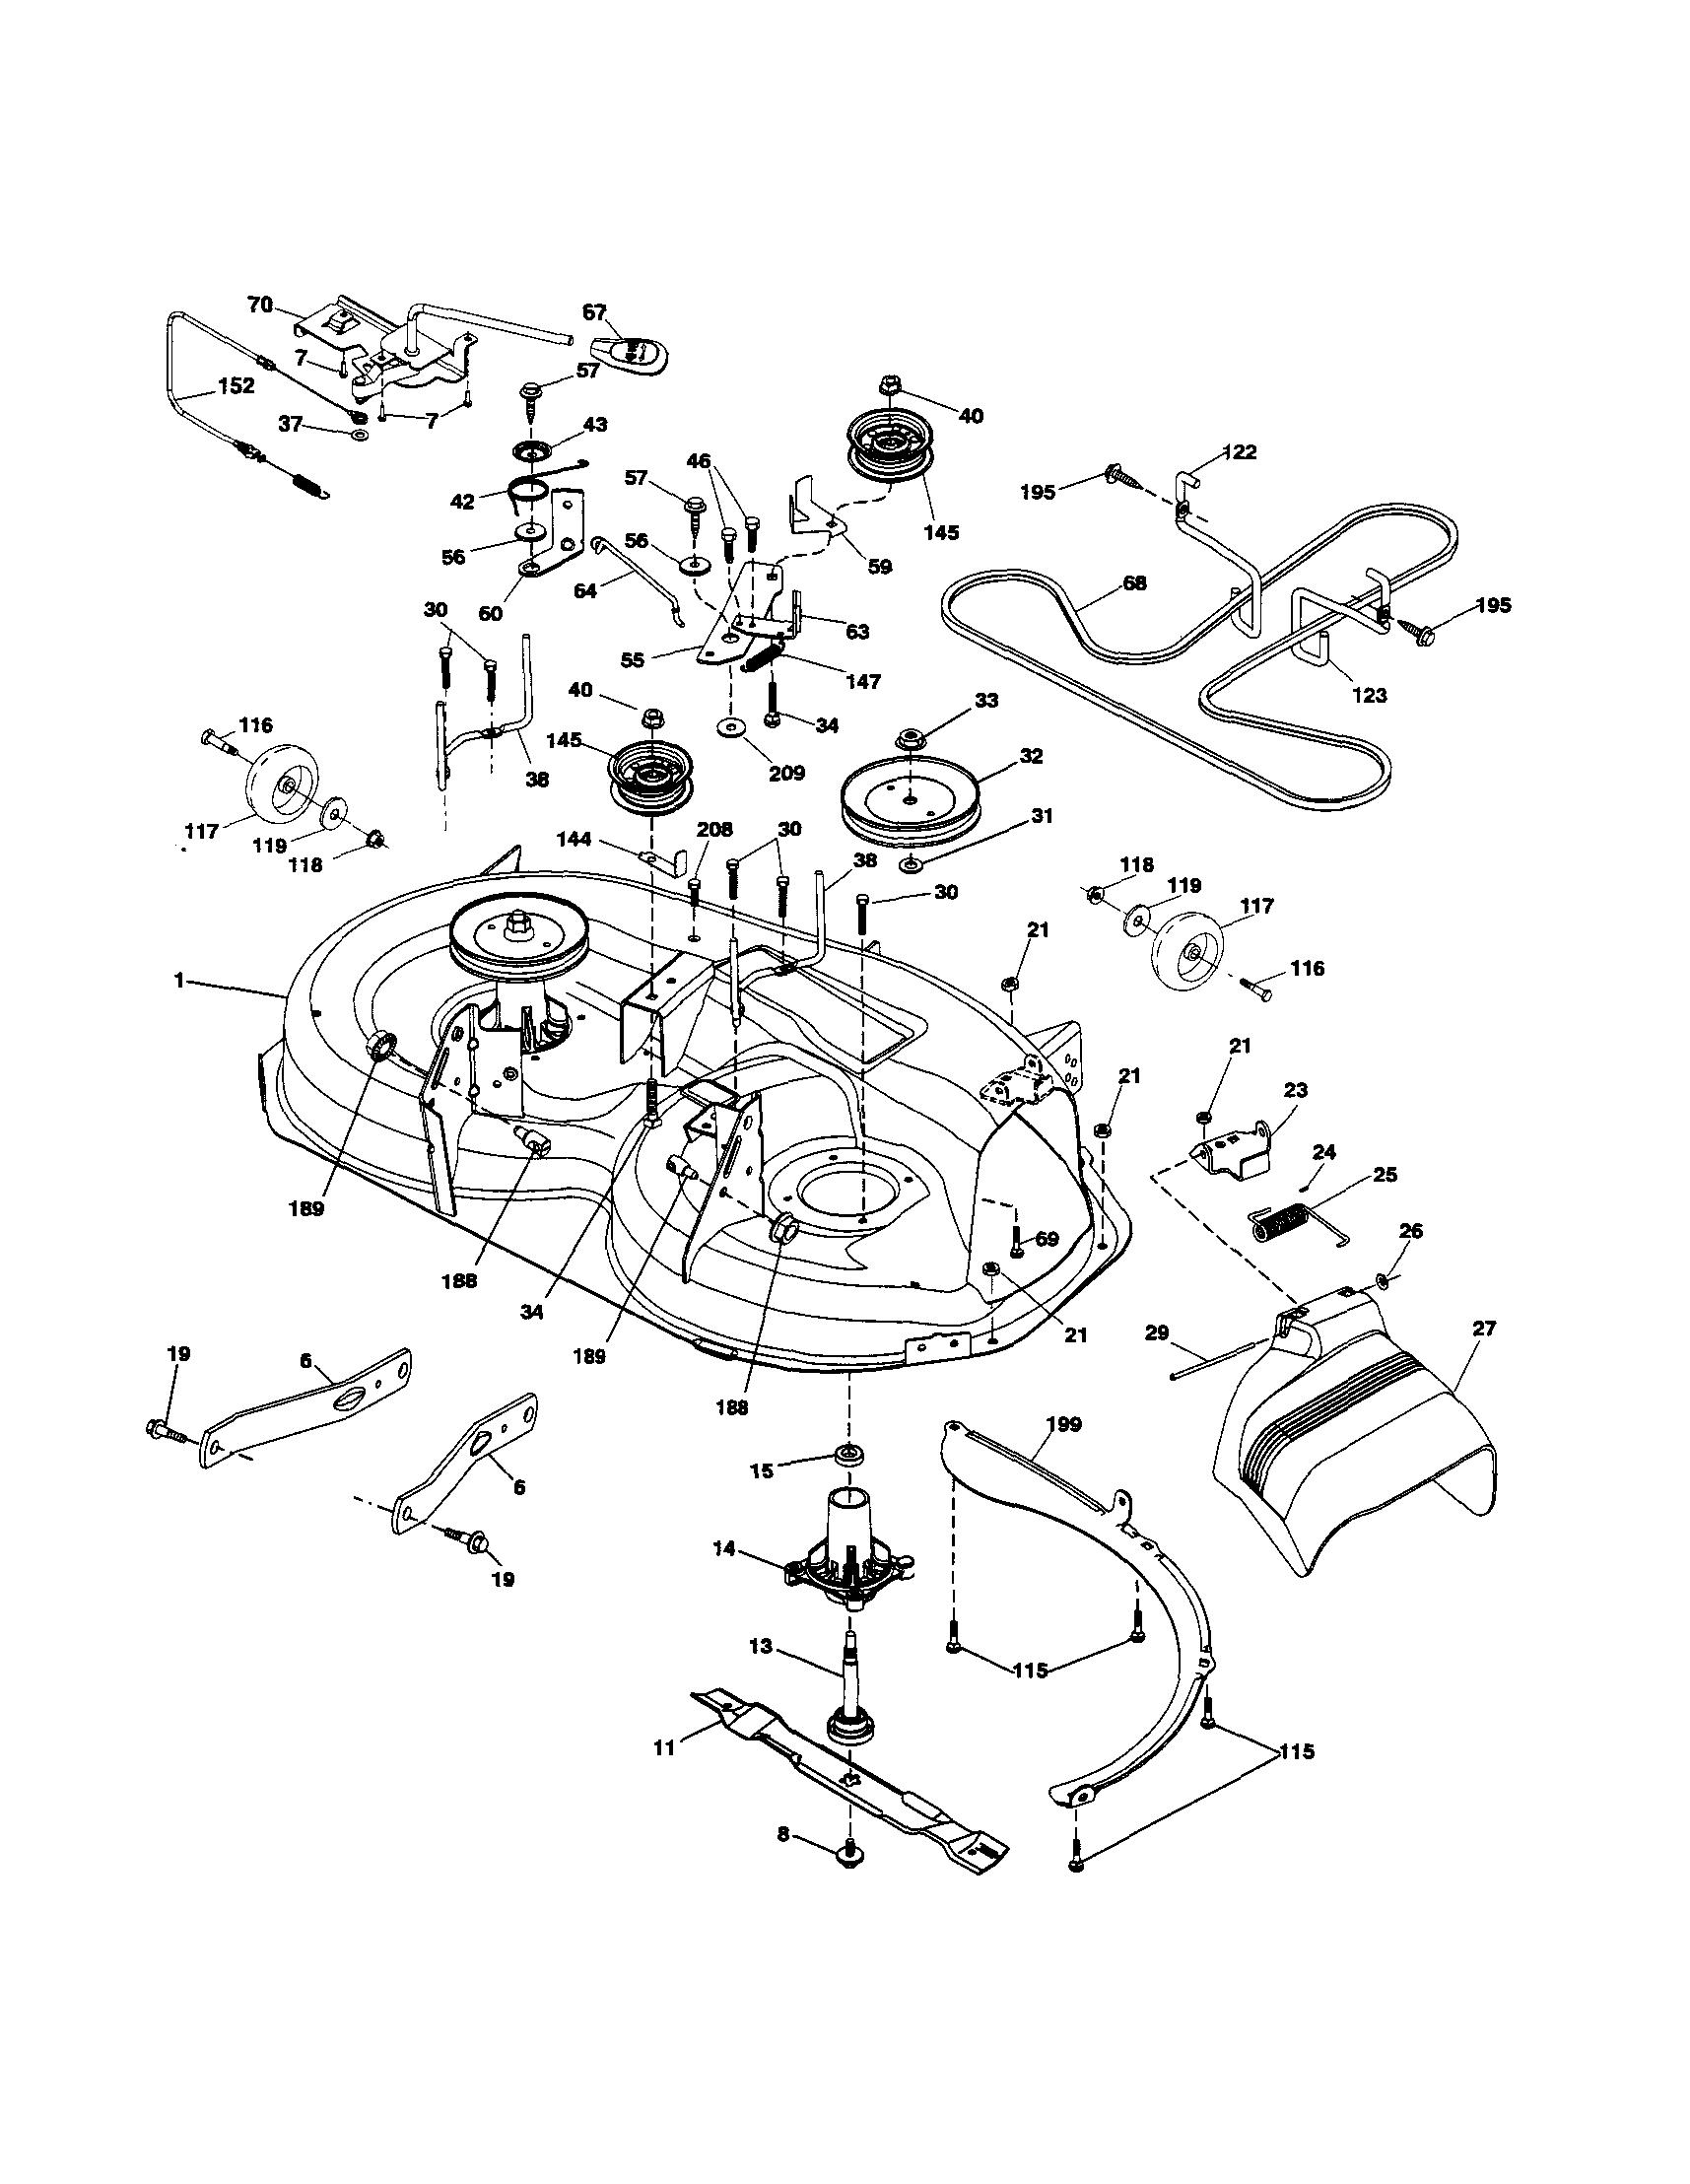 Husqvarna Lawn Mower Parts Diagram